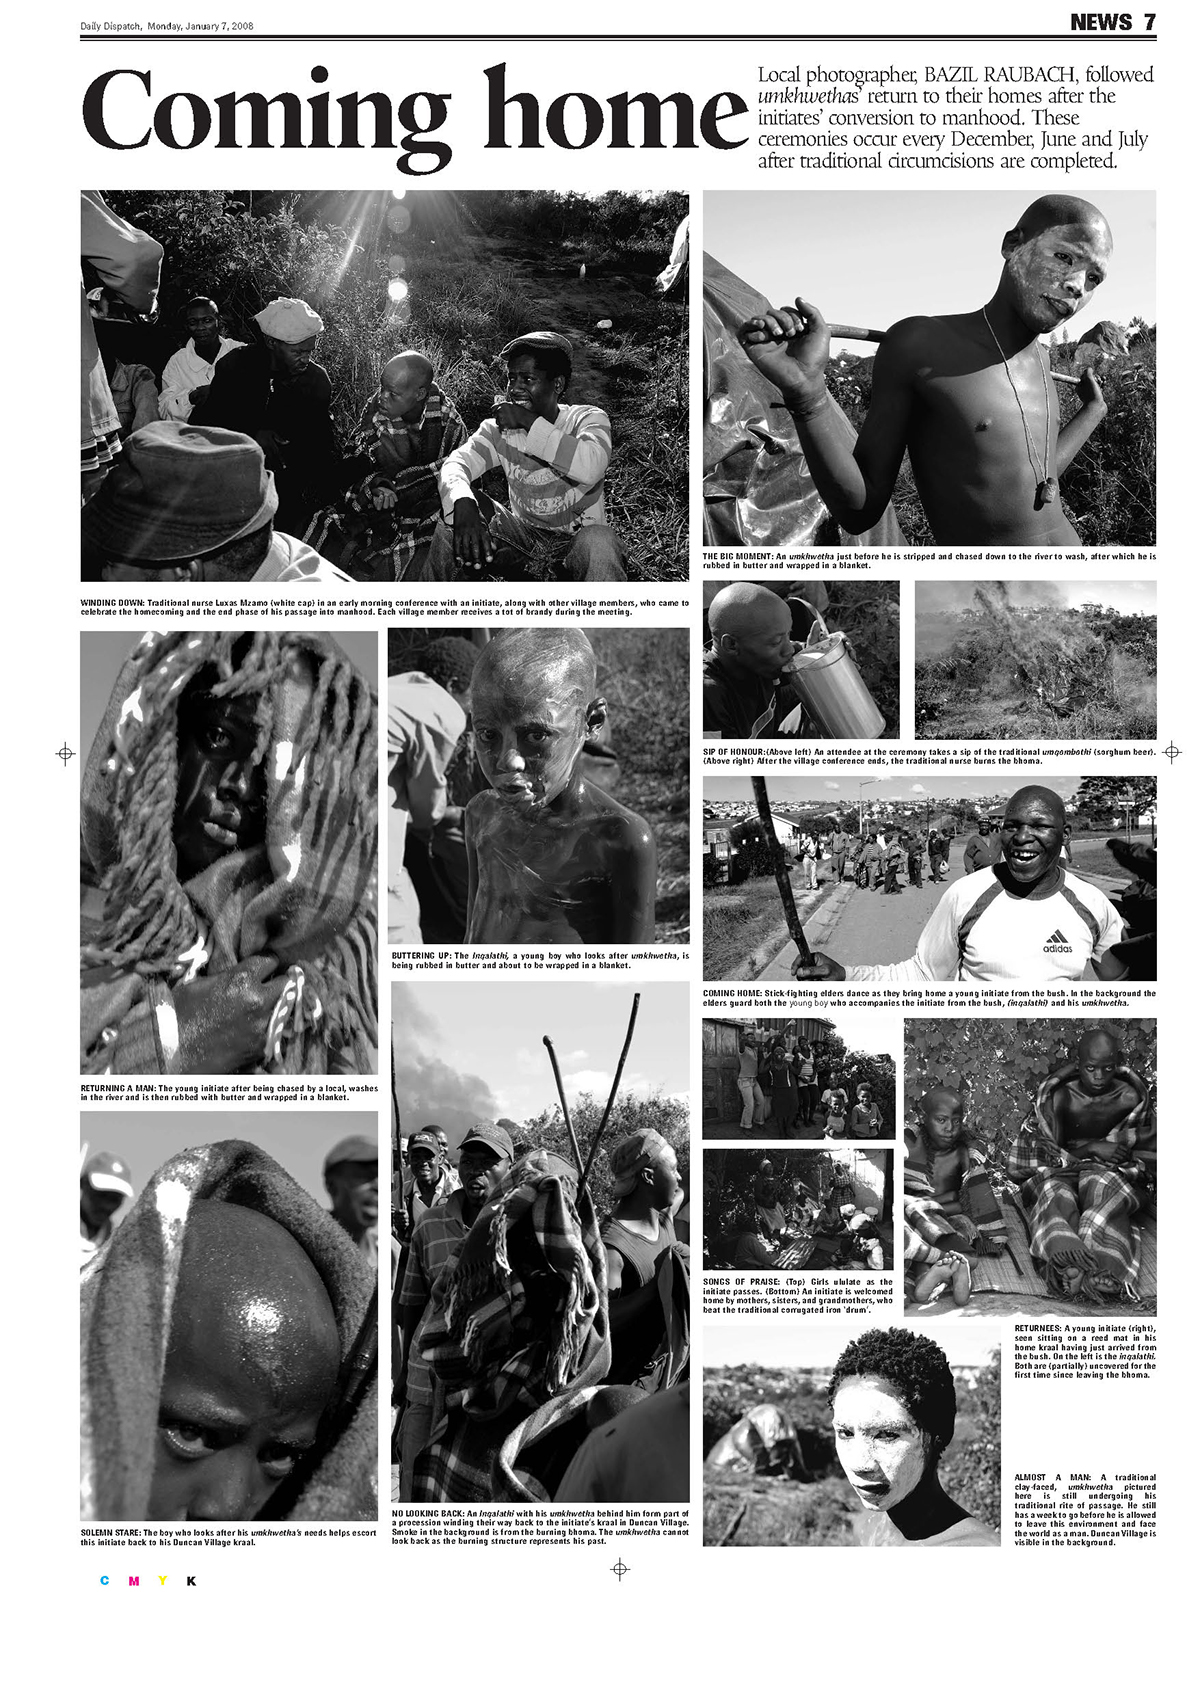 newspaper photo essay layouts